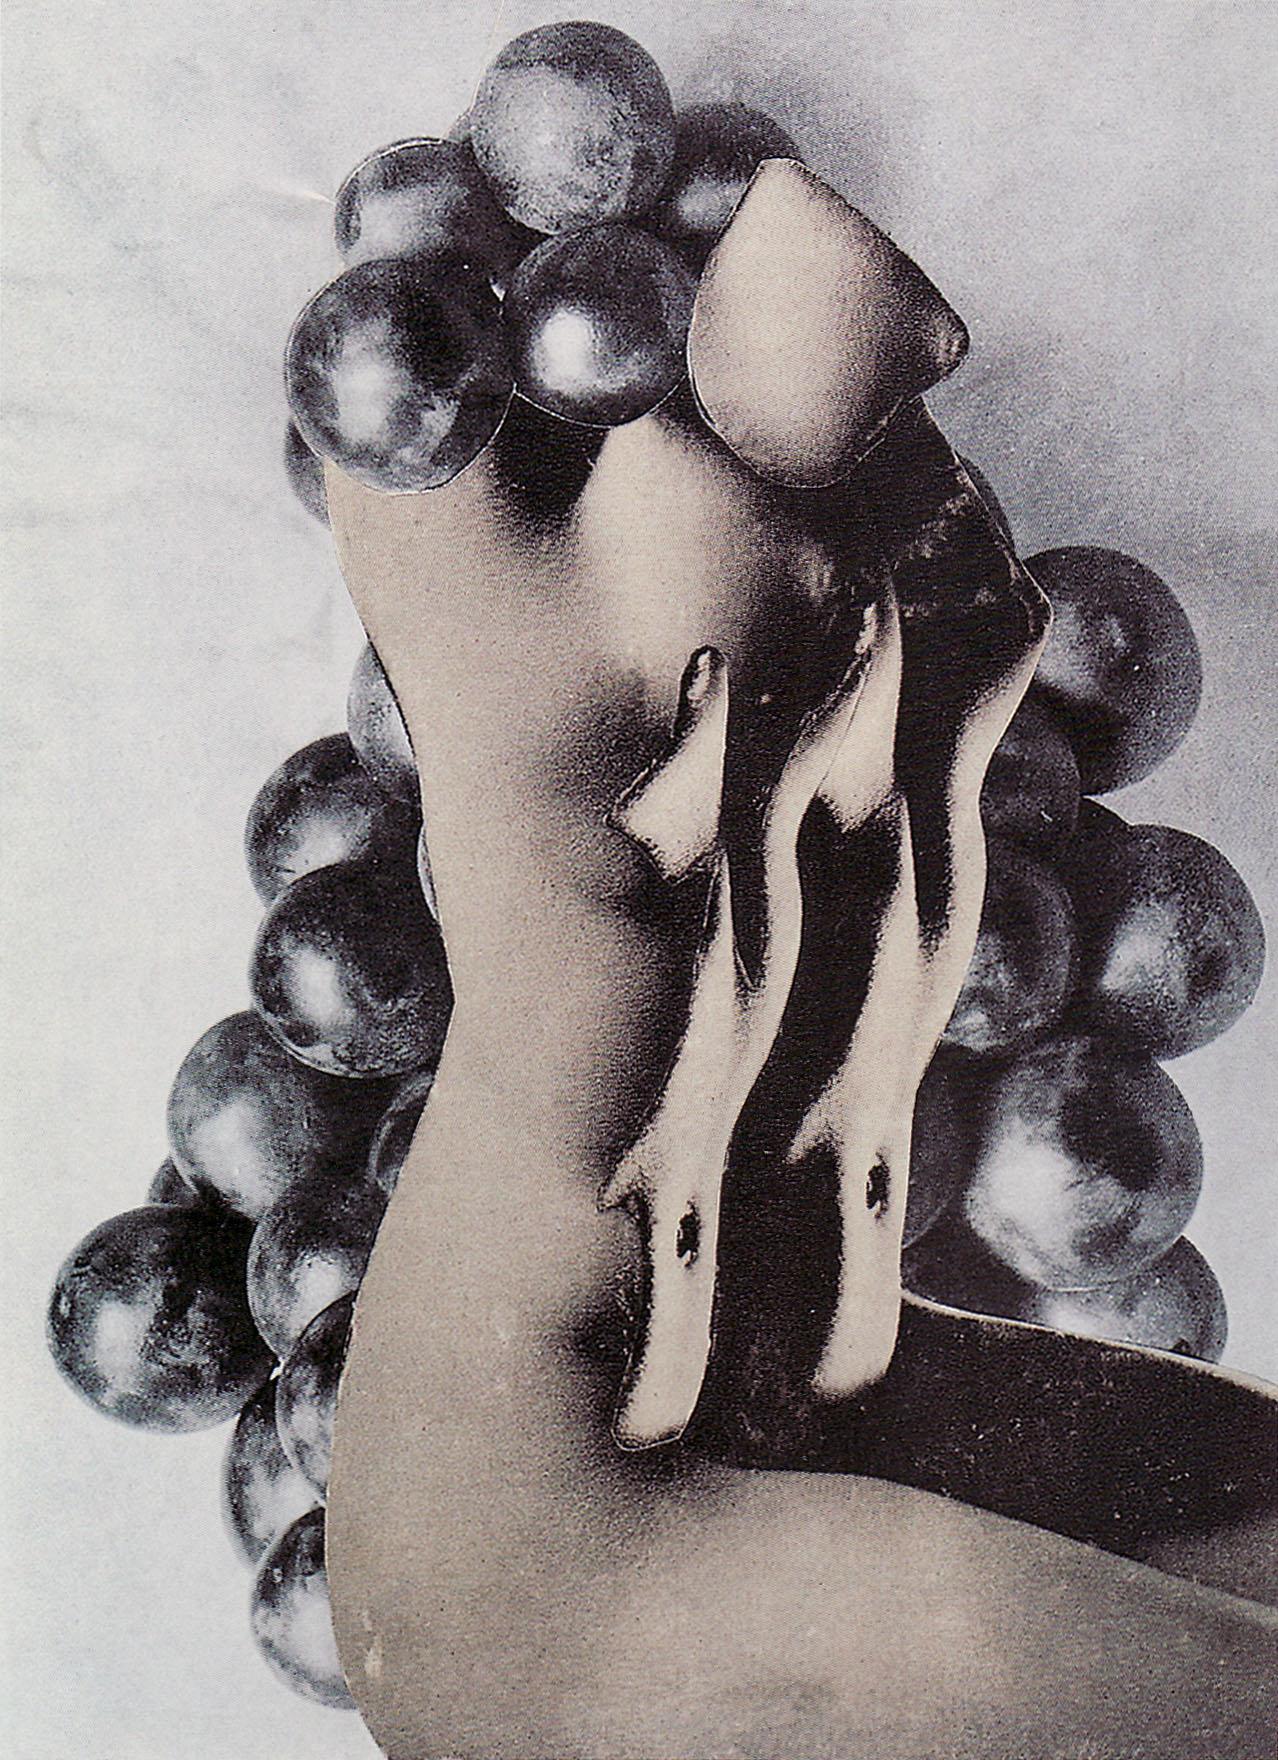 Karel Teige- Collage # 271, 1943 (c) Nachlass Karel Teige